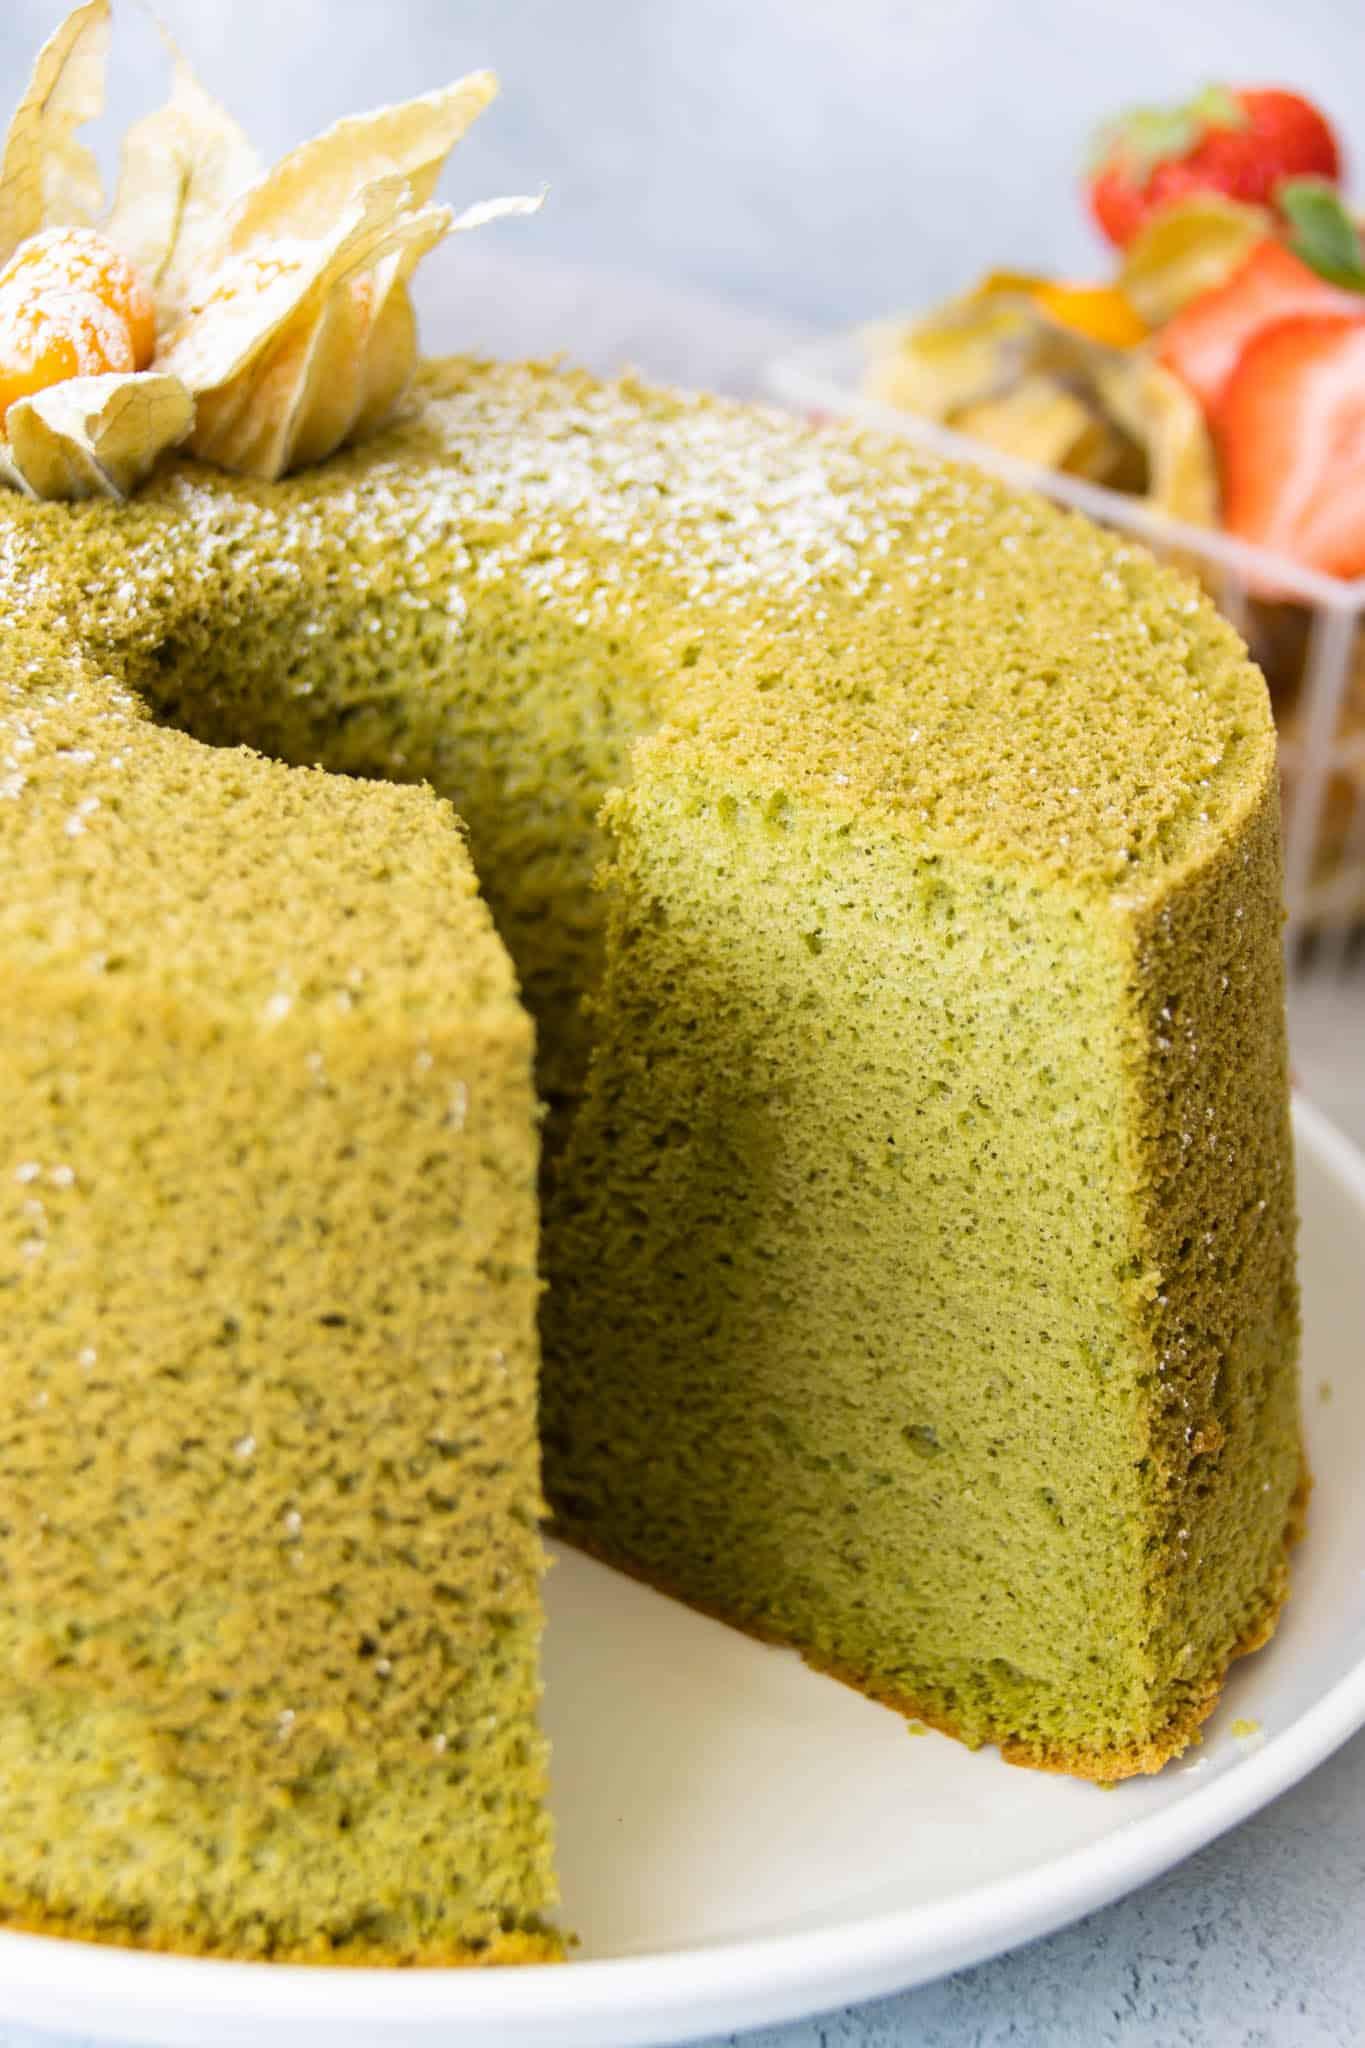 Matcha (green tea) chiffon cake with a light, fluffy and moist crumb